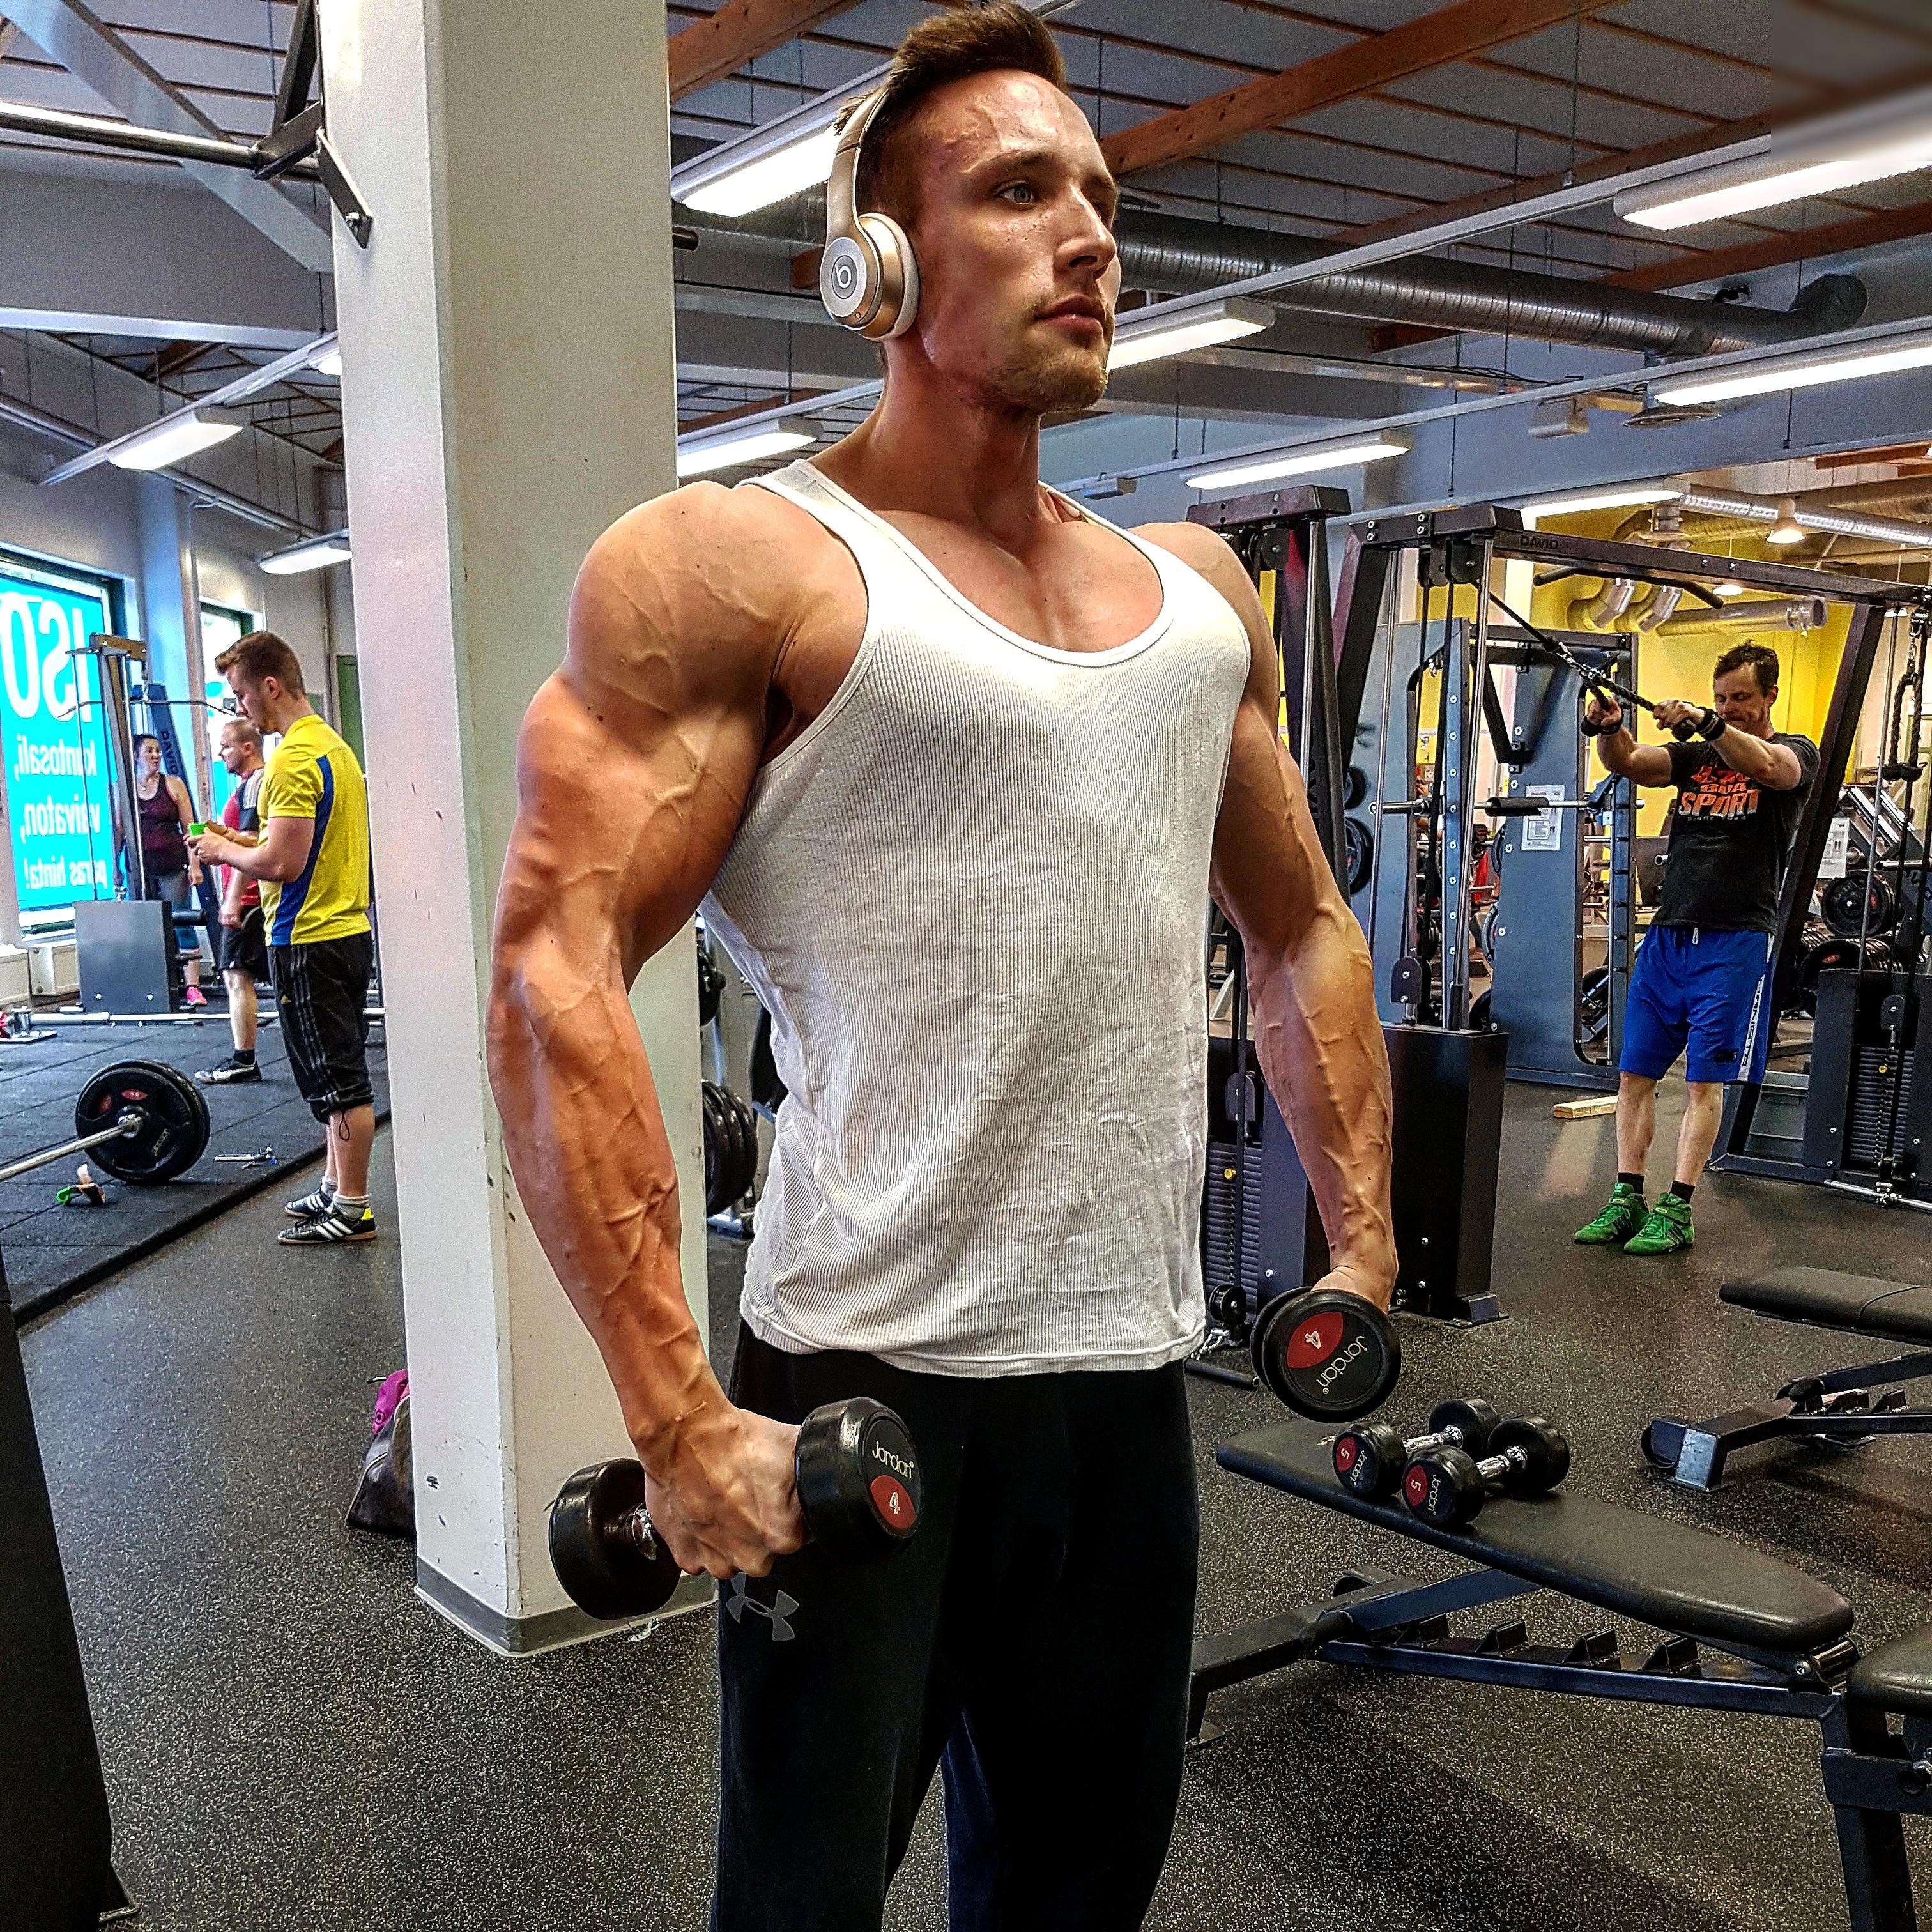 Isot lihakset pieni Dick